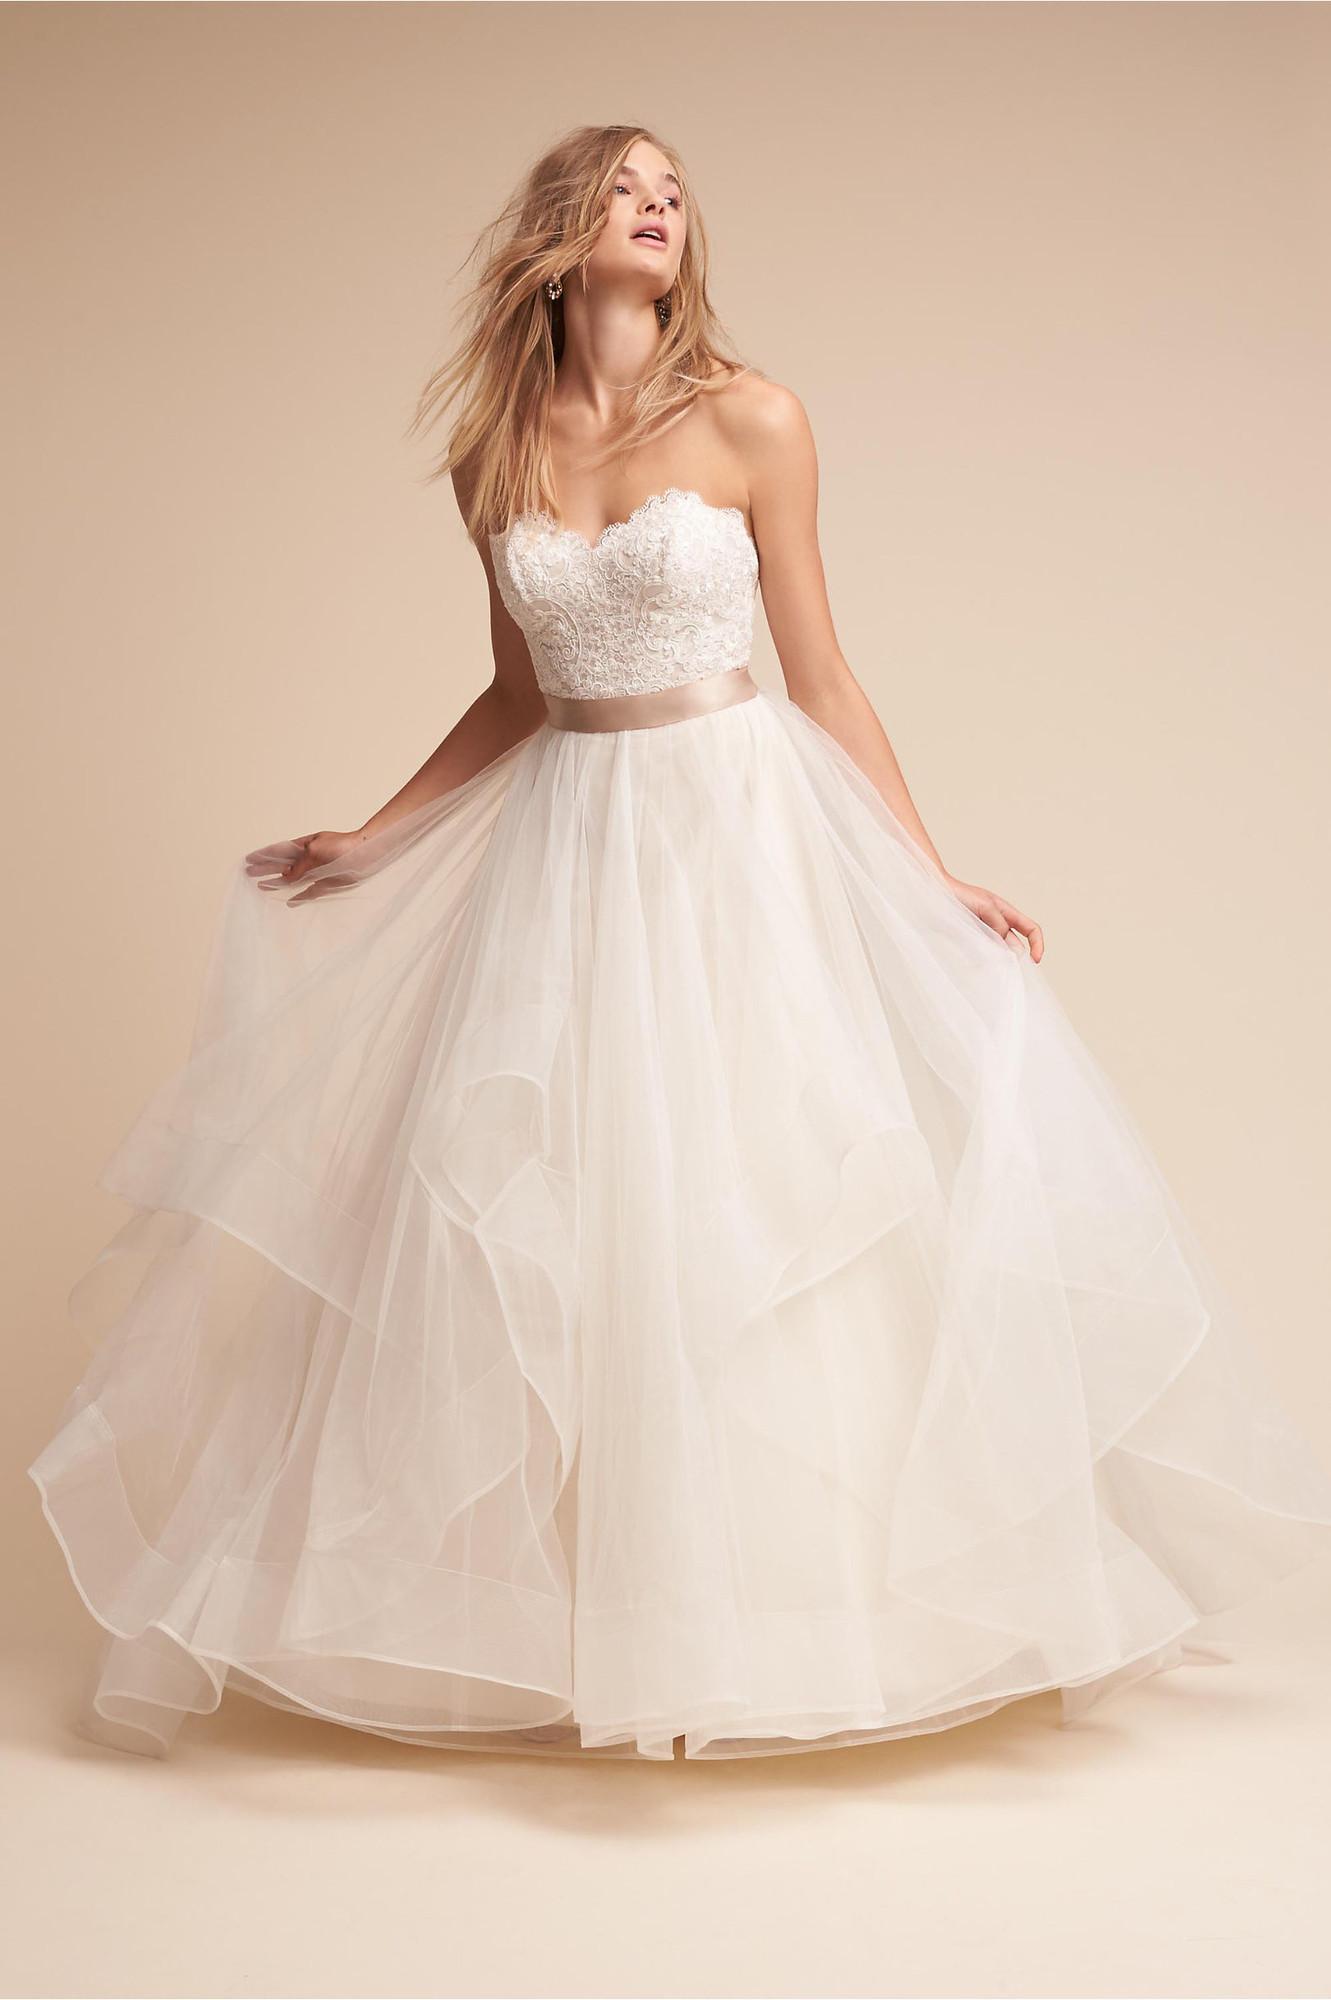 Rowena Gown Nan Wedding Dress By Bhldn Weddingwire Com